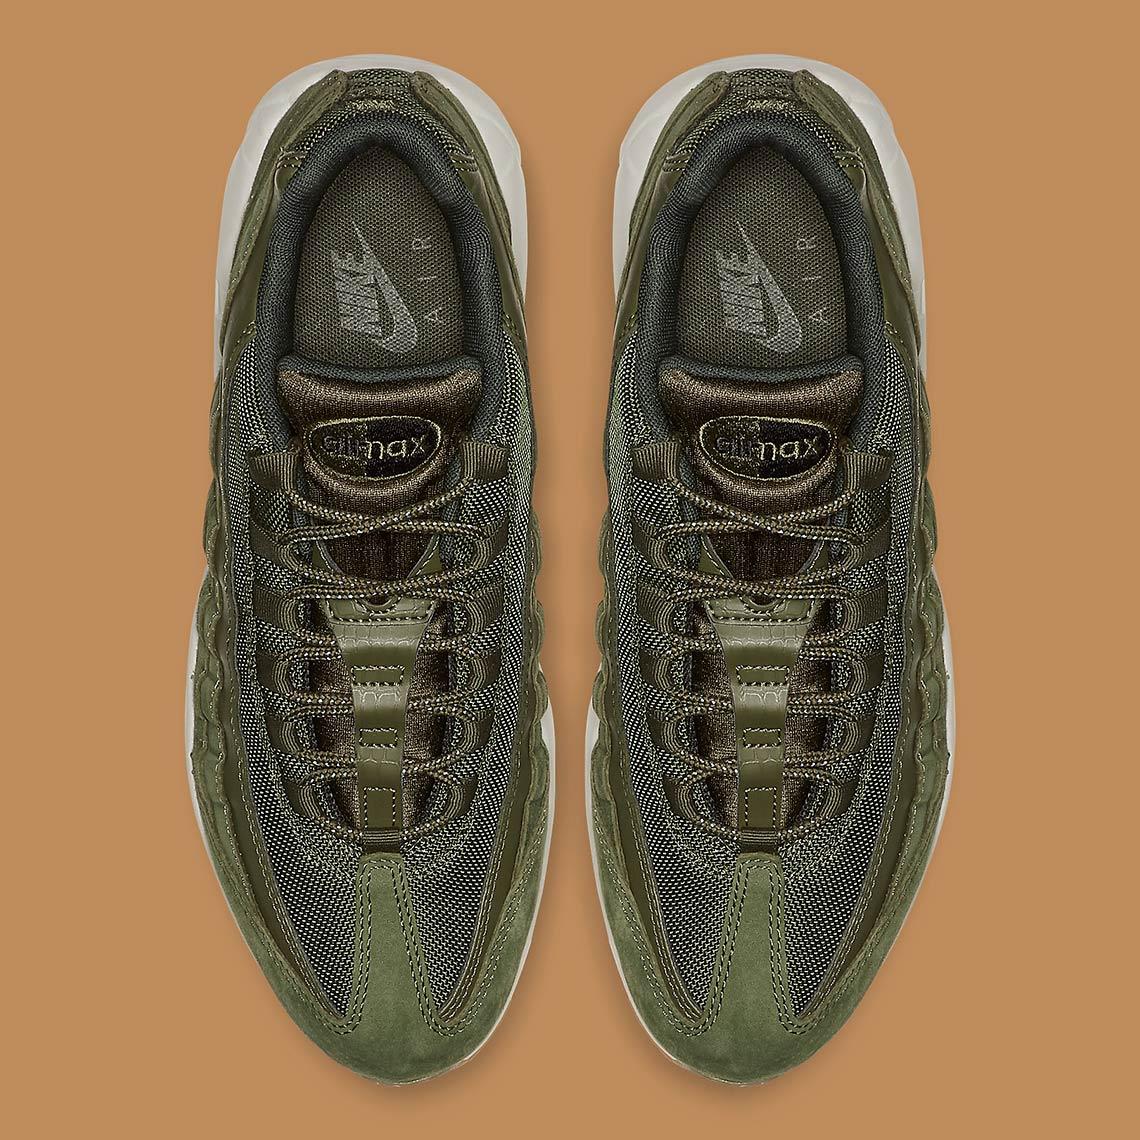 nike air max 95 olive aj2018 300 2 - Nike Air Max 95 Olive Canvas AJ2018-300 Release Info